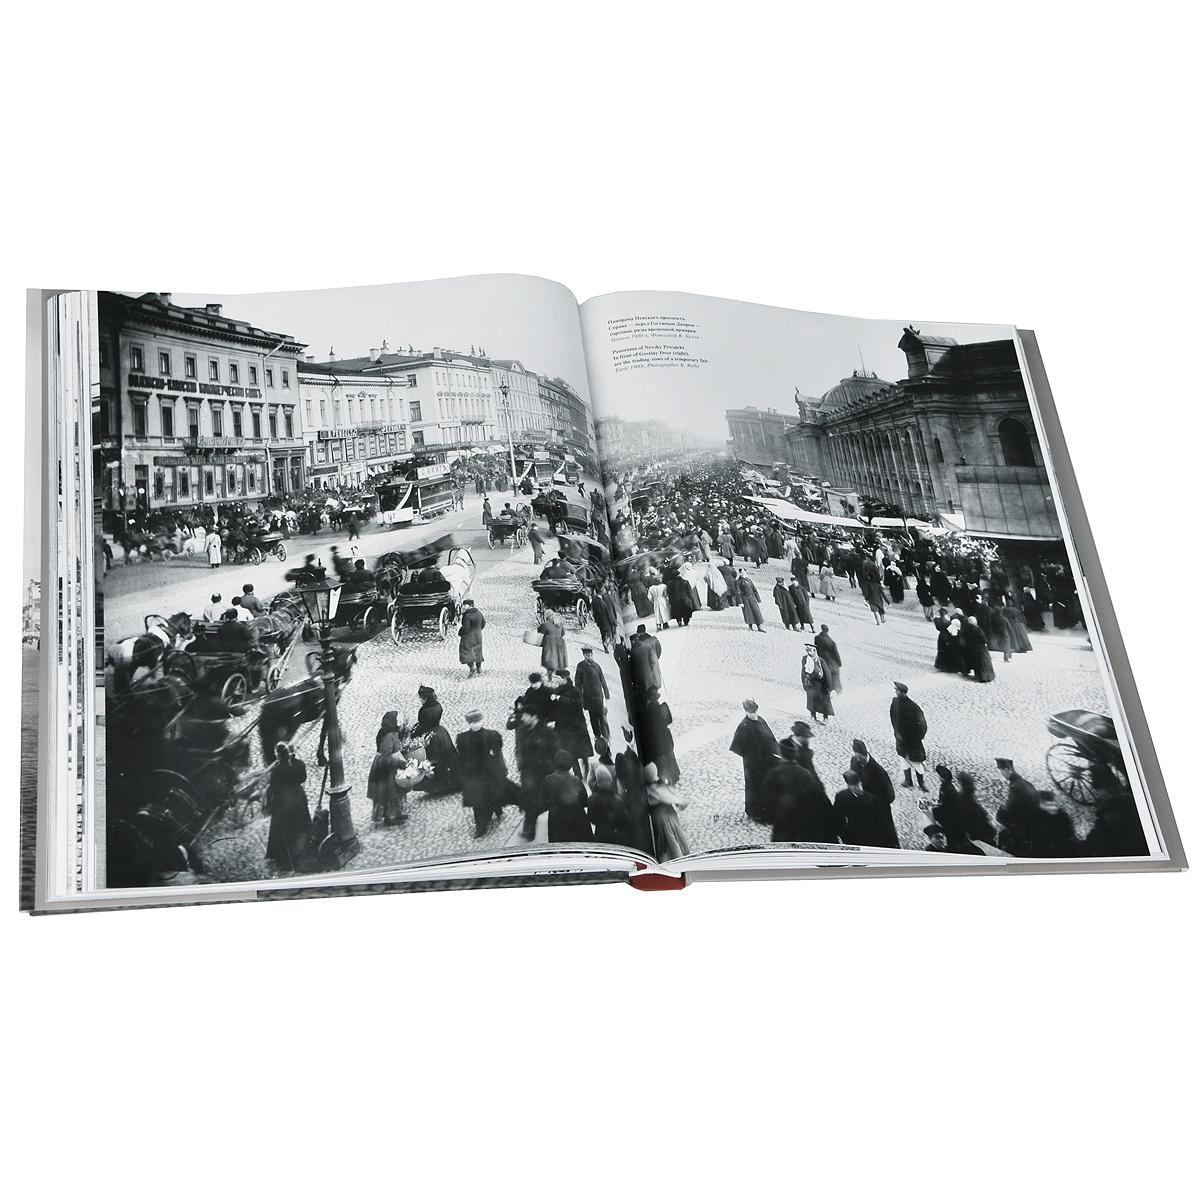 Санкт-Петербург в старых фотографиях. Конец XIX - начало XX века. Альбом / Saint Petersburg in Old Photographs: Late 19th - Early 20th Centuries